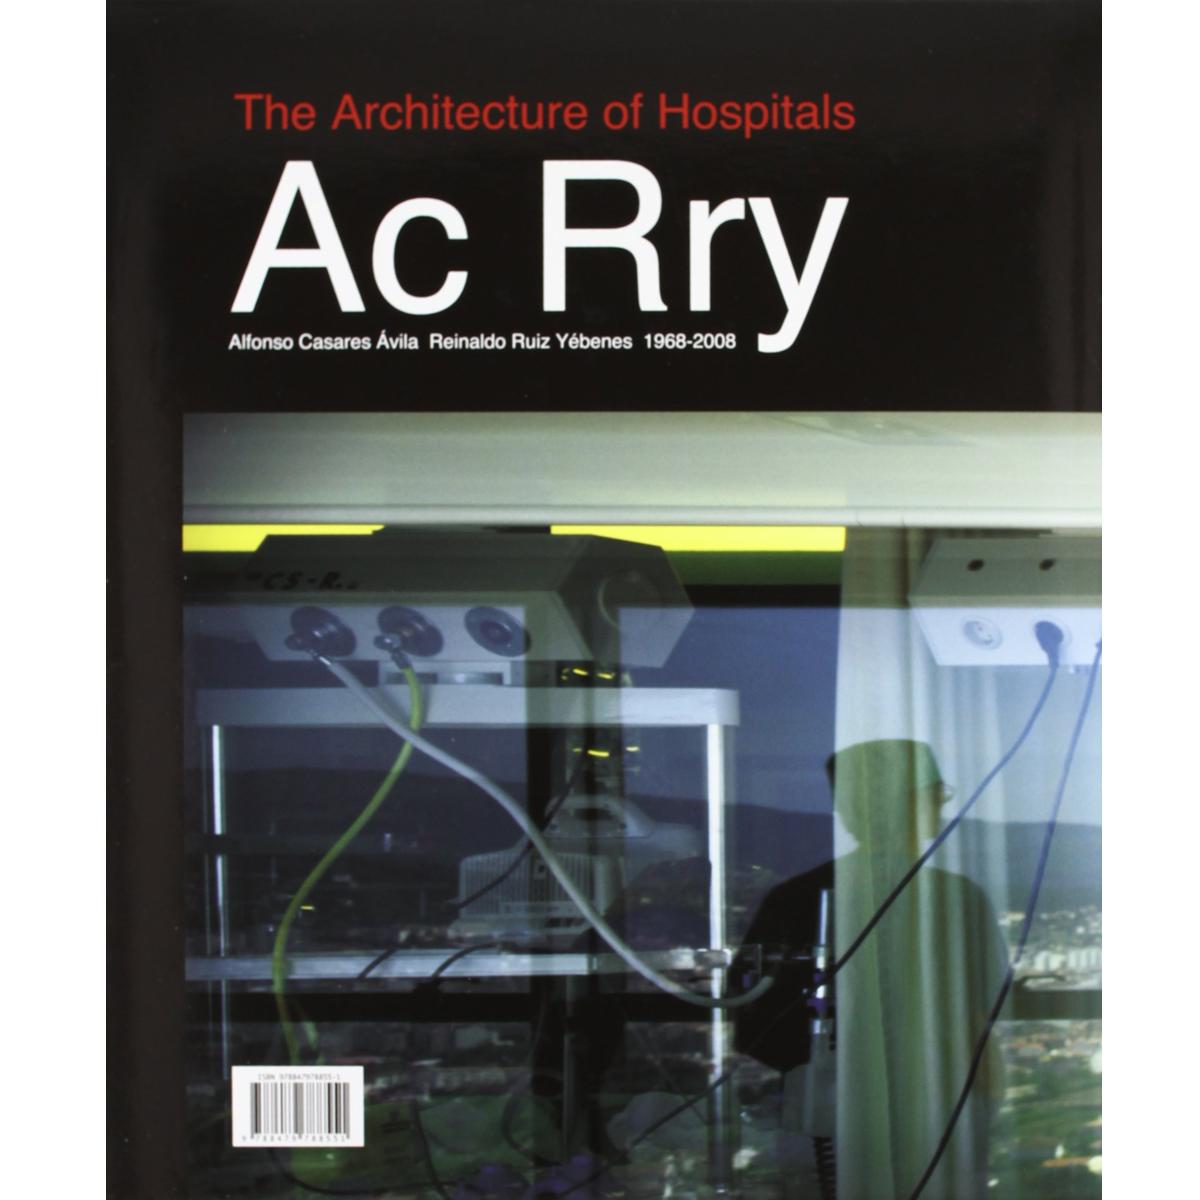 La arquitectura del hospital Ac Rry 1968-2008